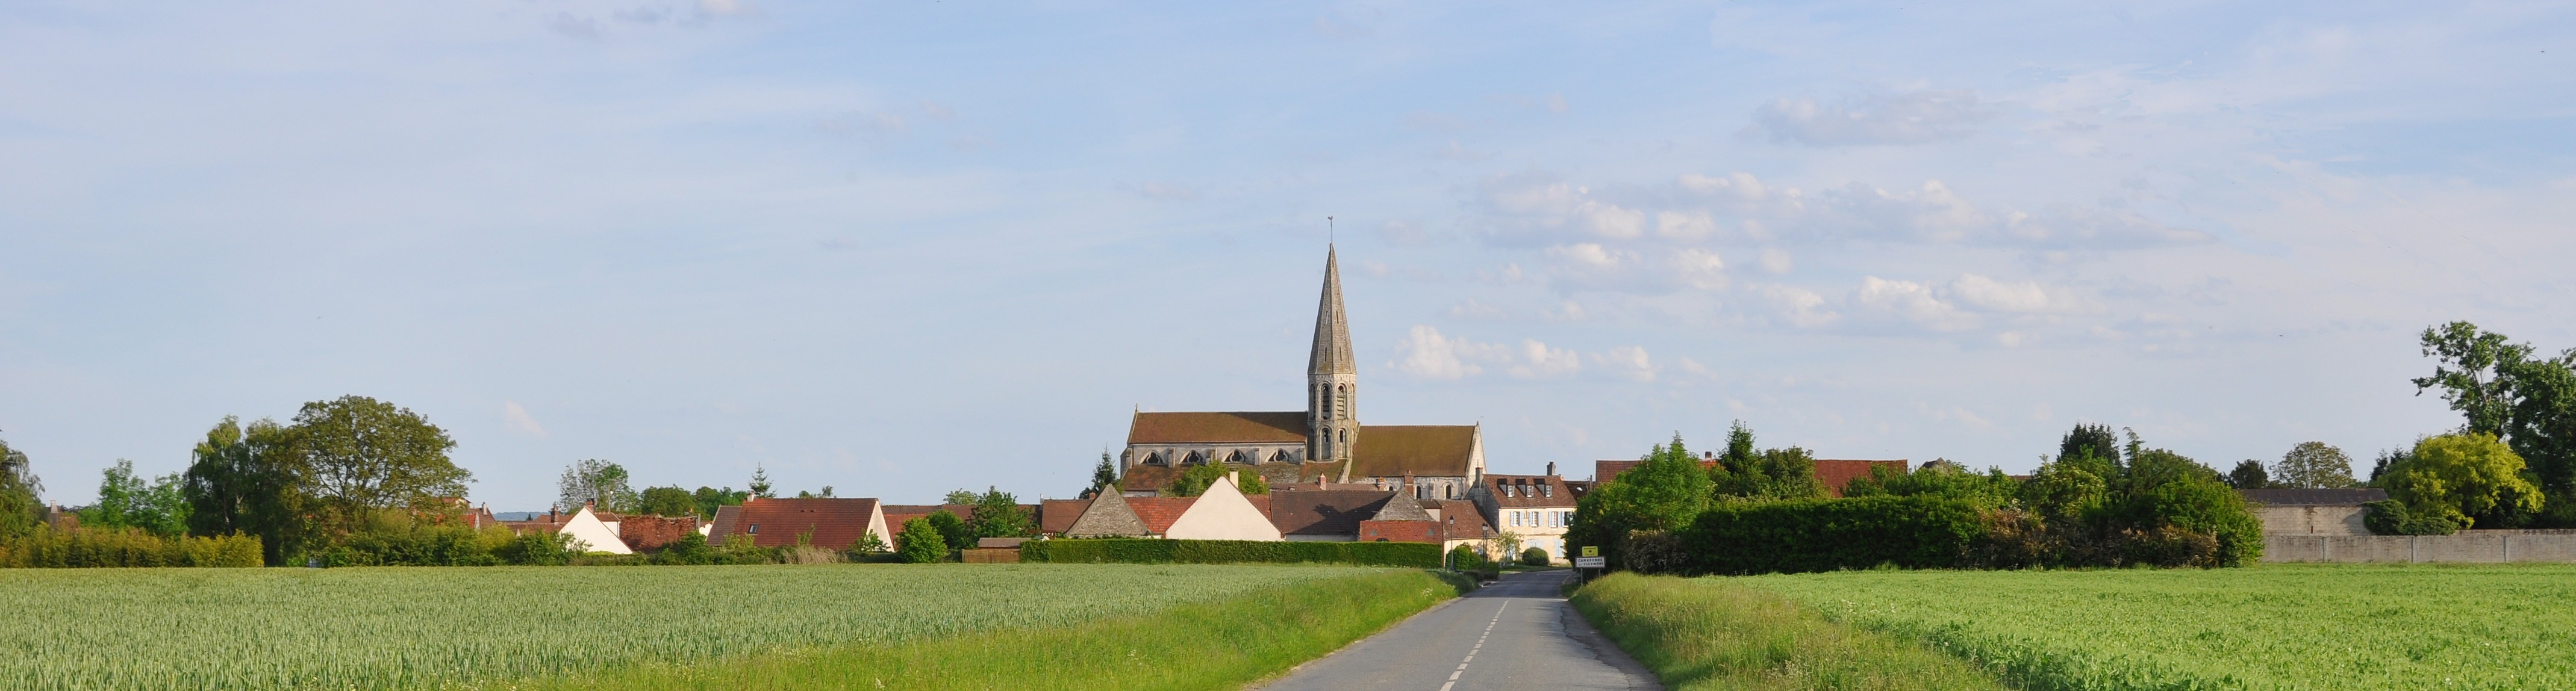 Cambronne-lès-Clermont